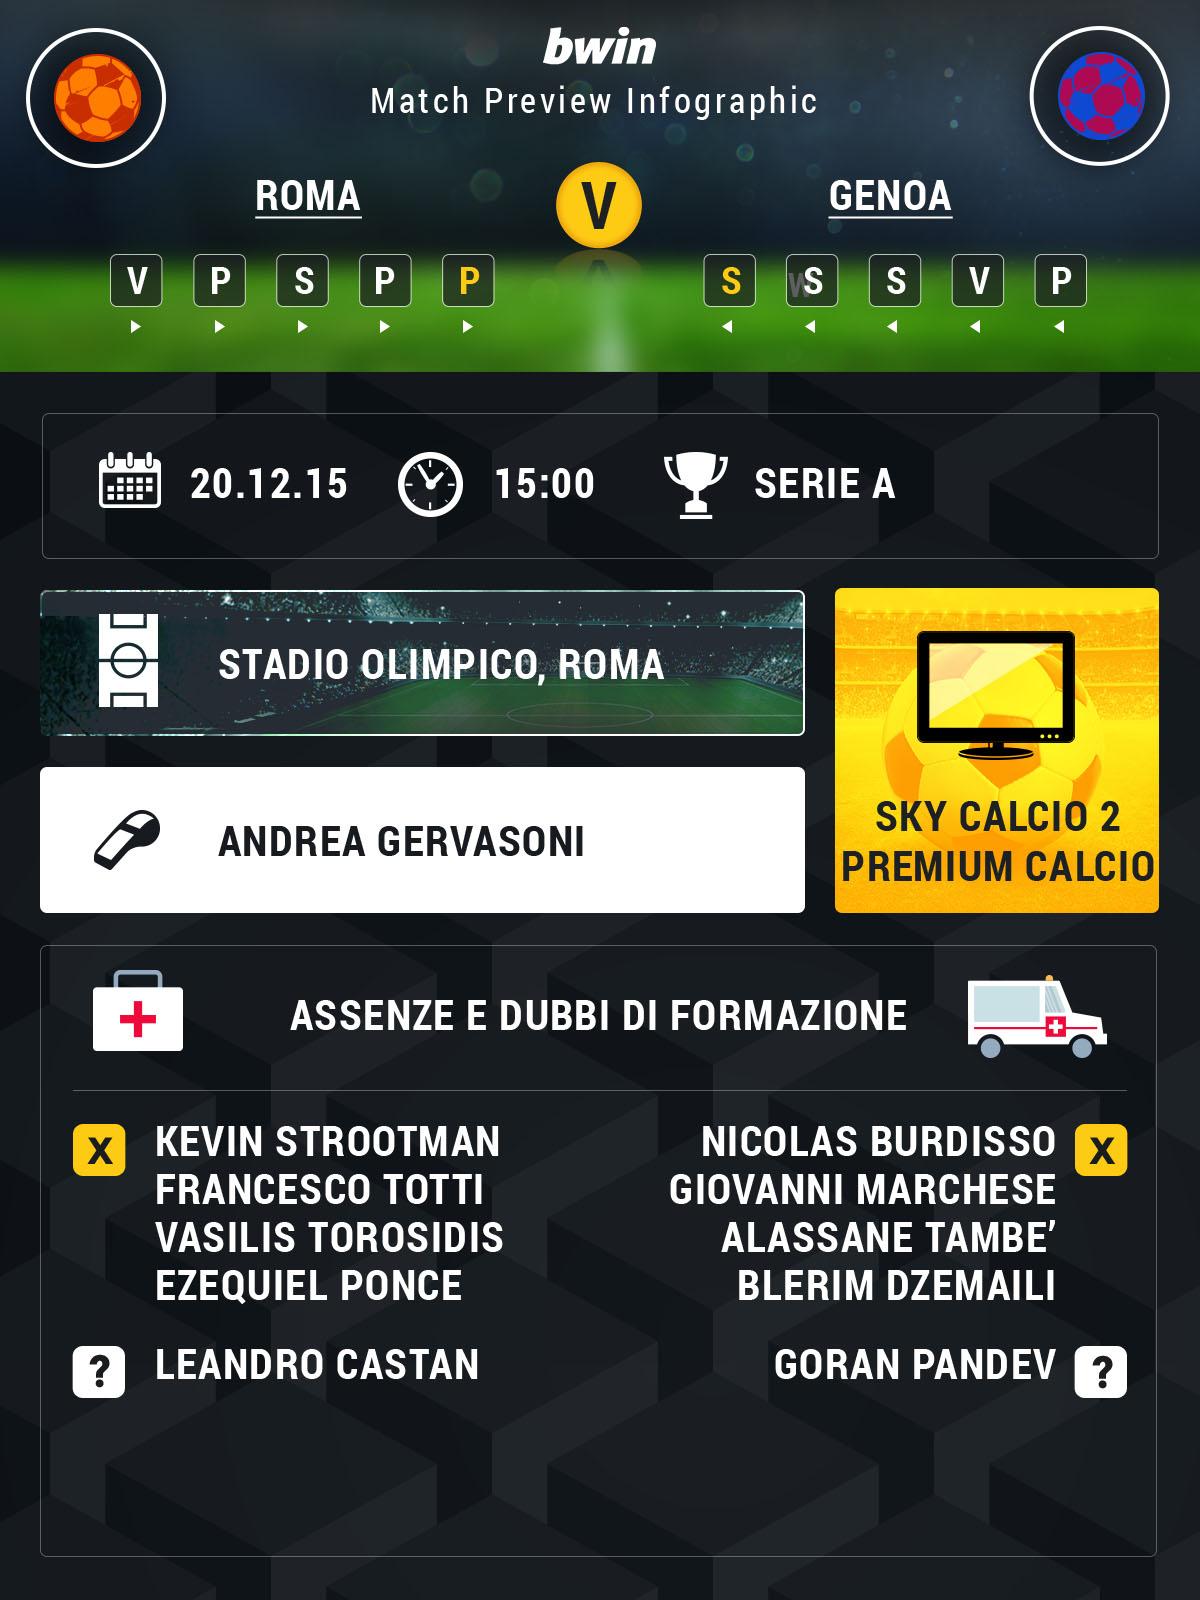 Roma-Genoa info